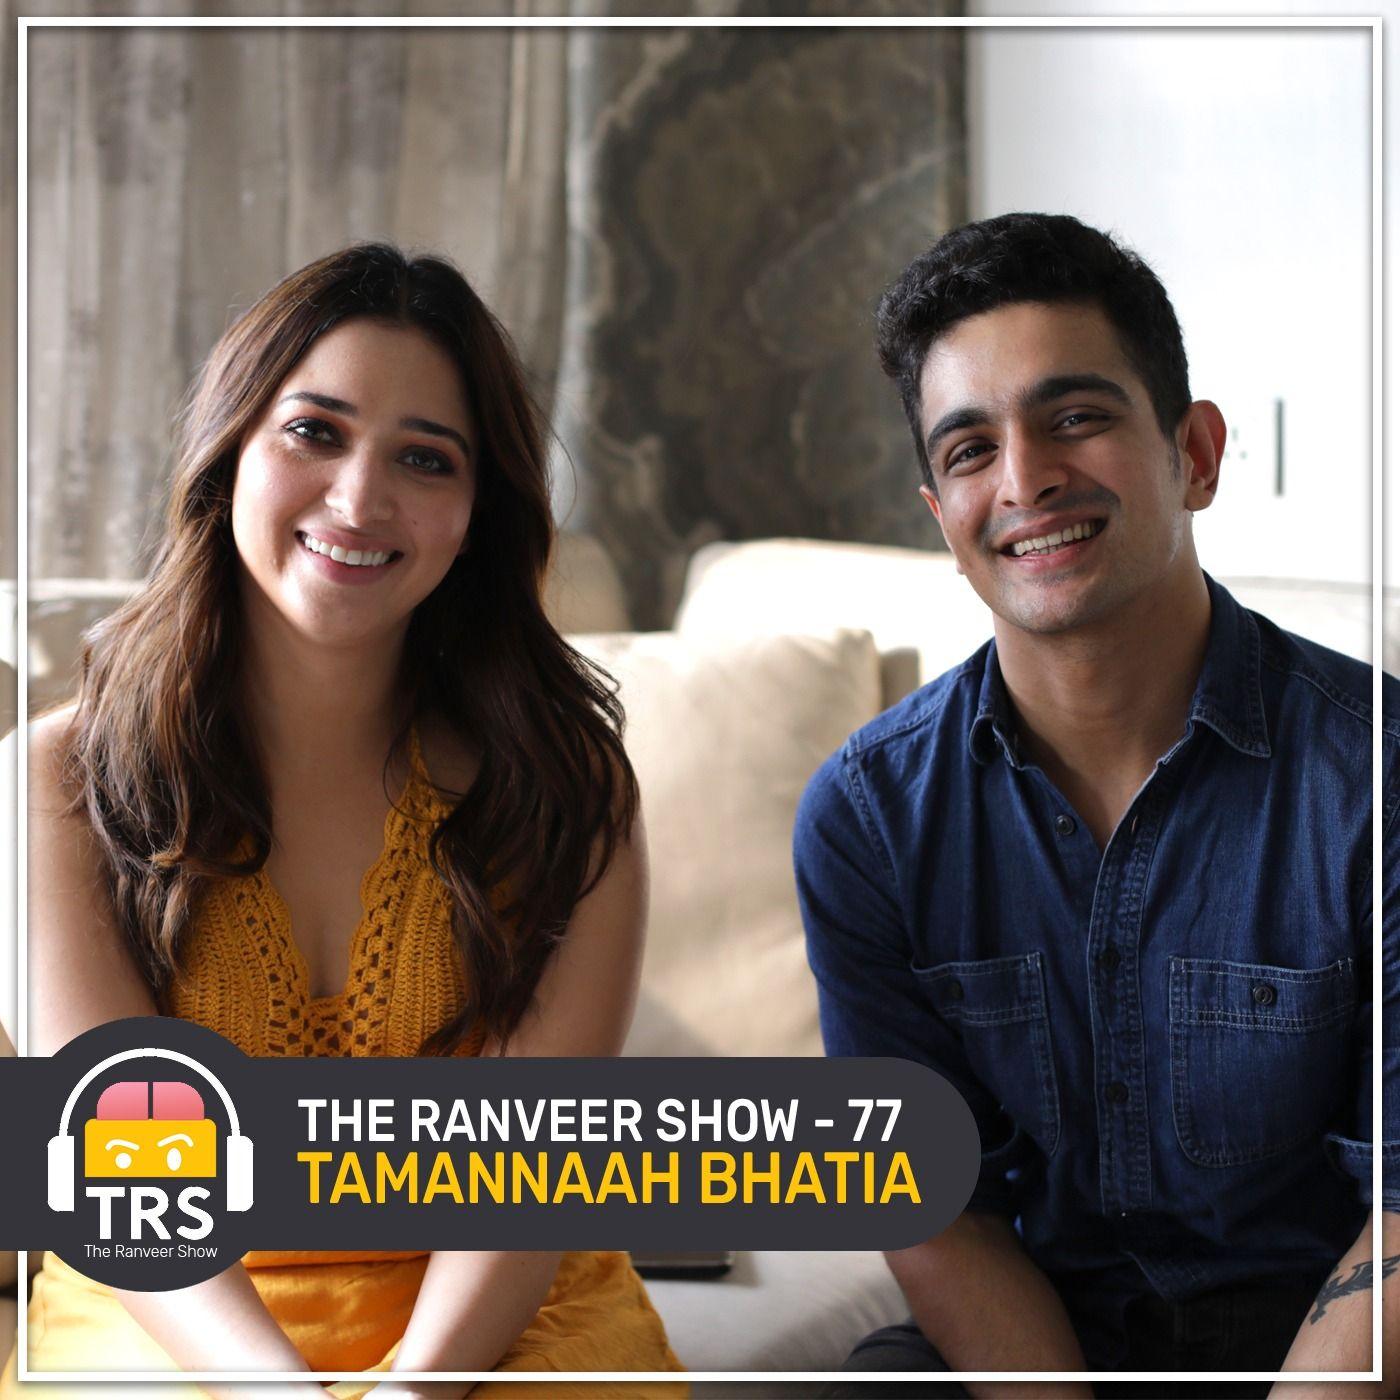 Tamannaah Bhatia On Love Life, Career Growth Mentality & Covid Experience | The Ranveer Show 77